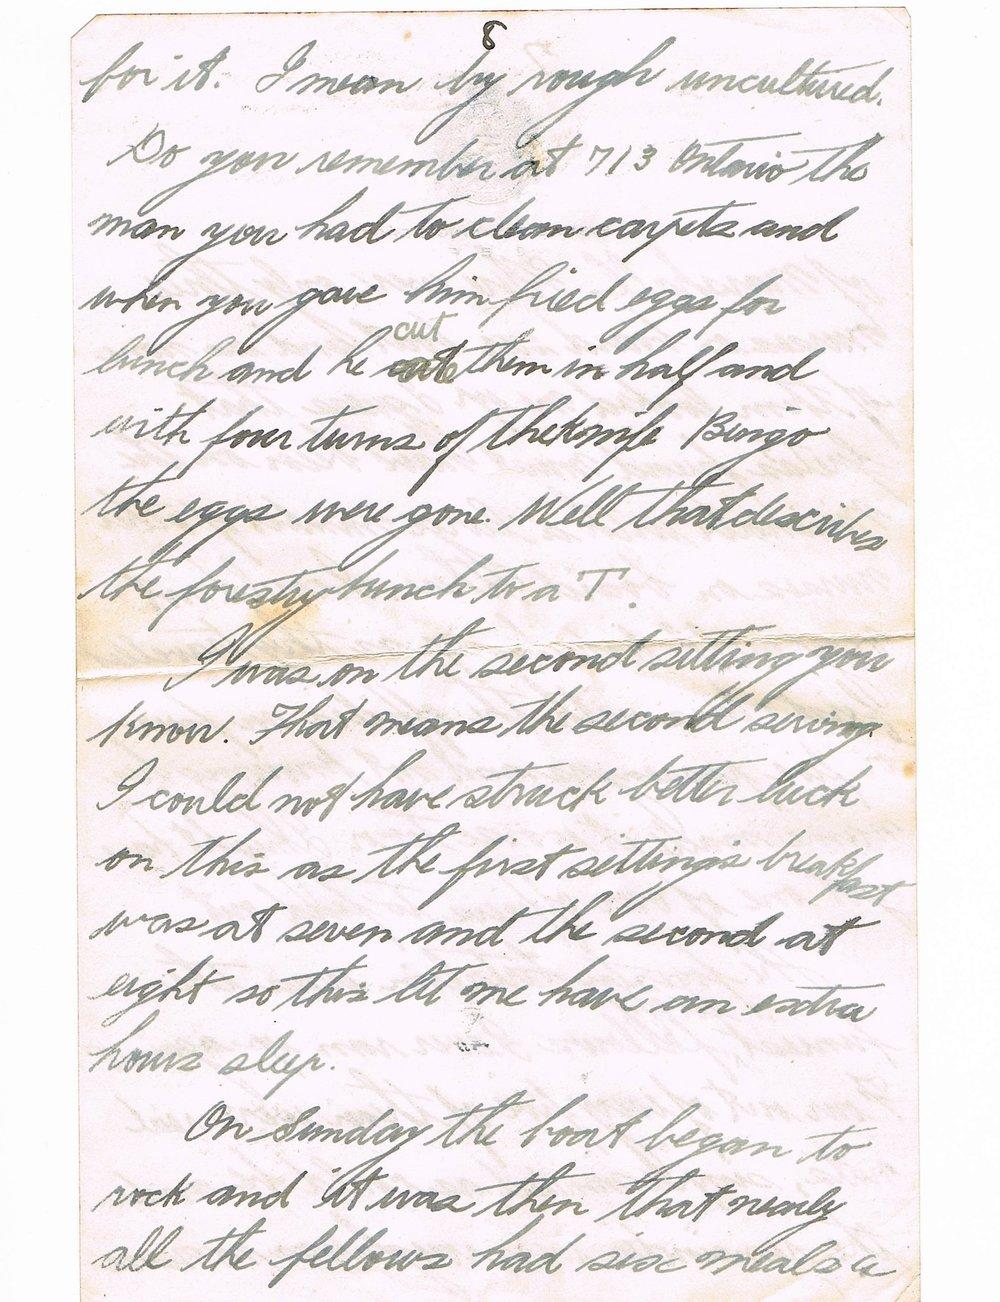 Basil Vale January 2, 1918 letter - page 8.jpg